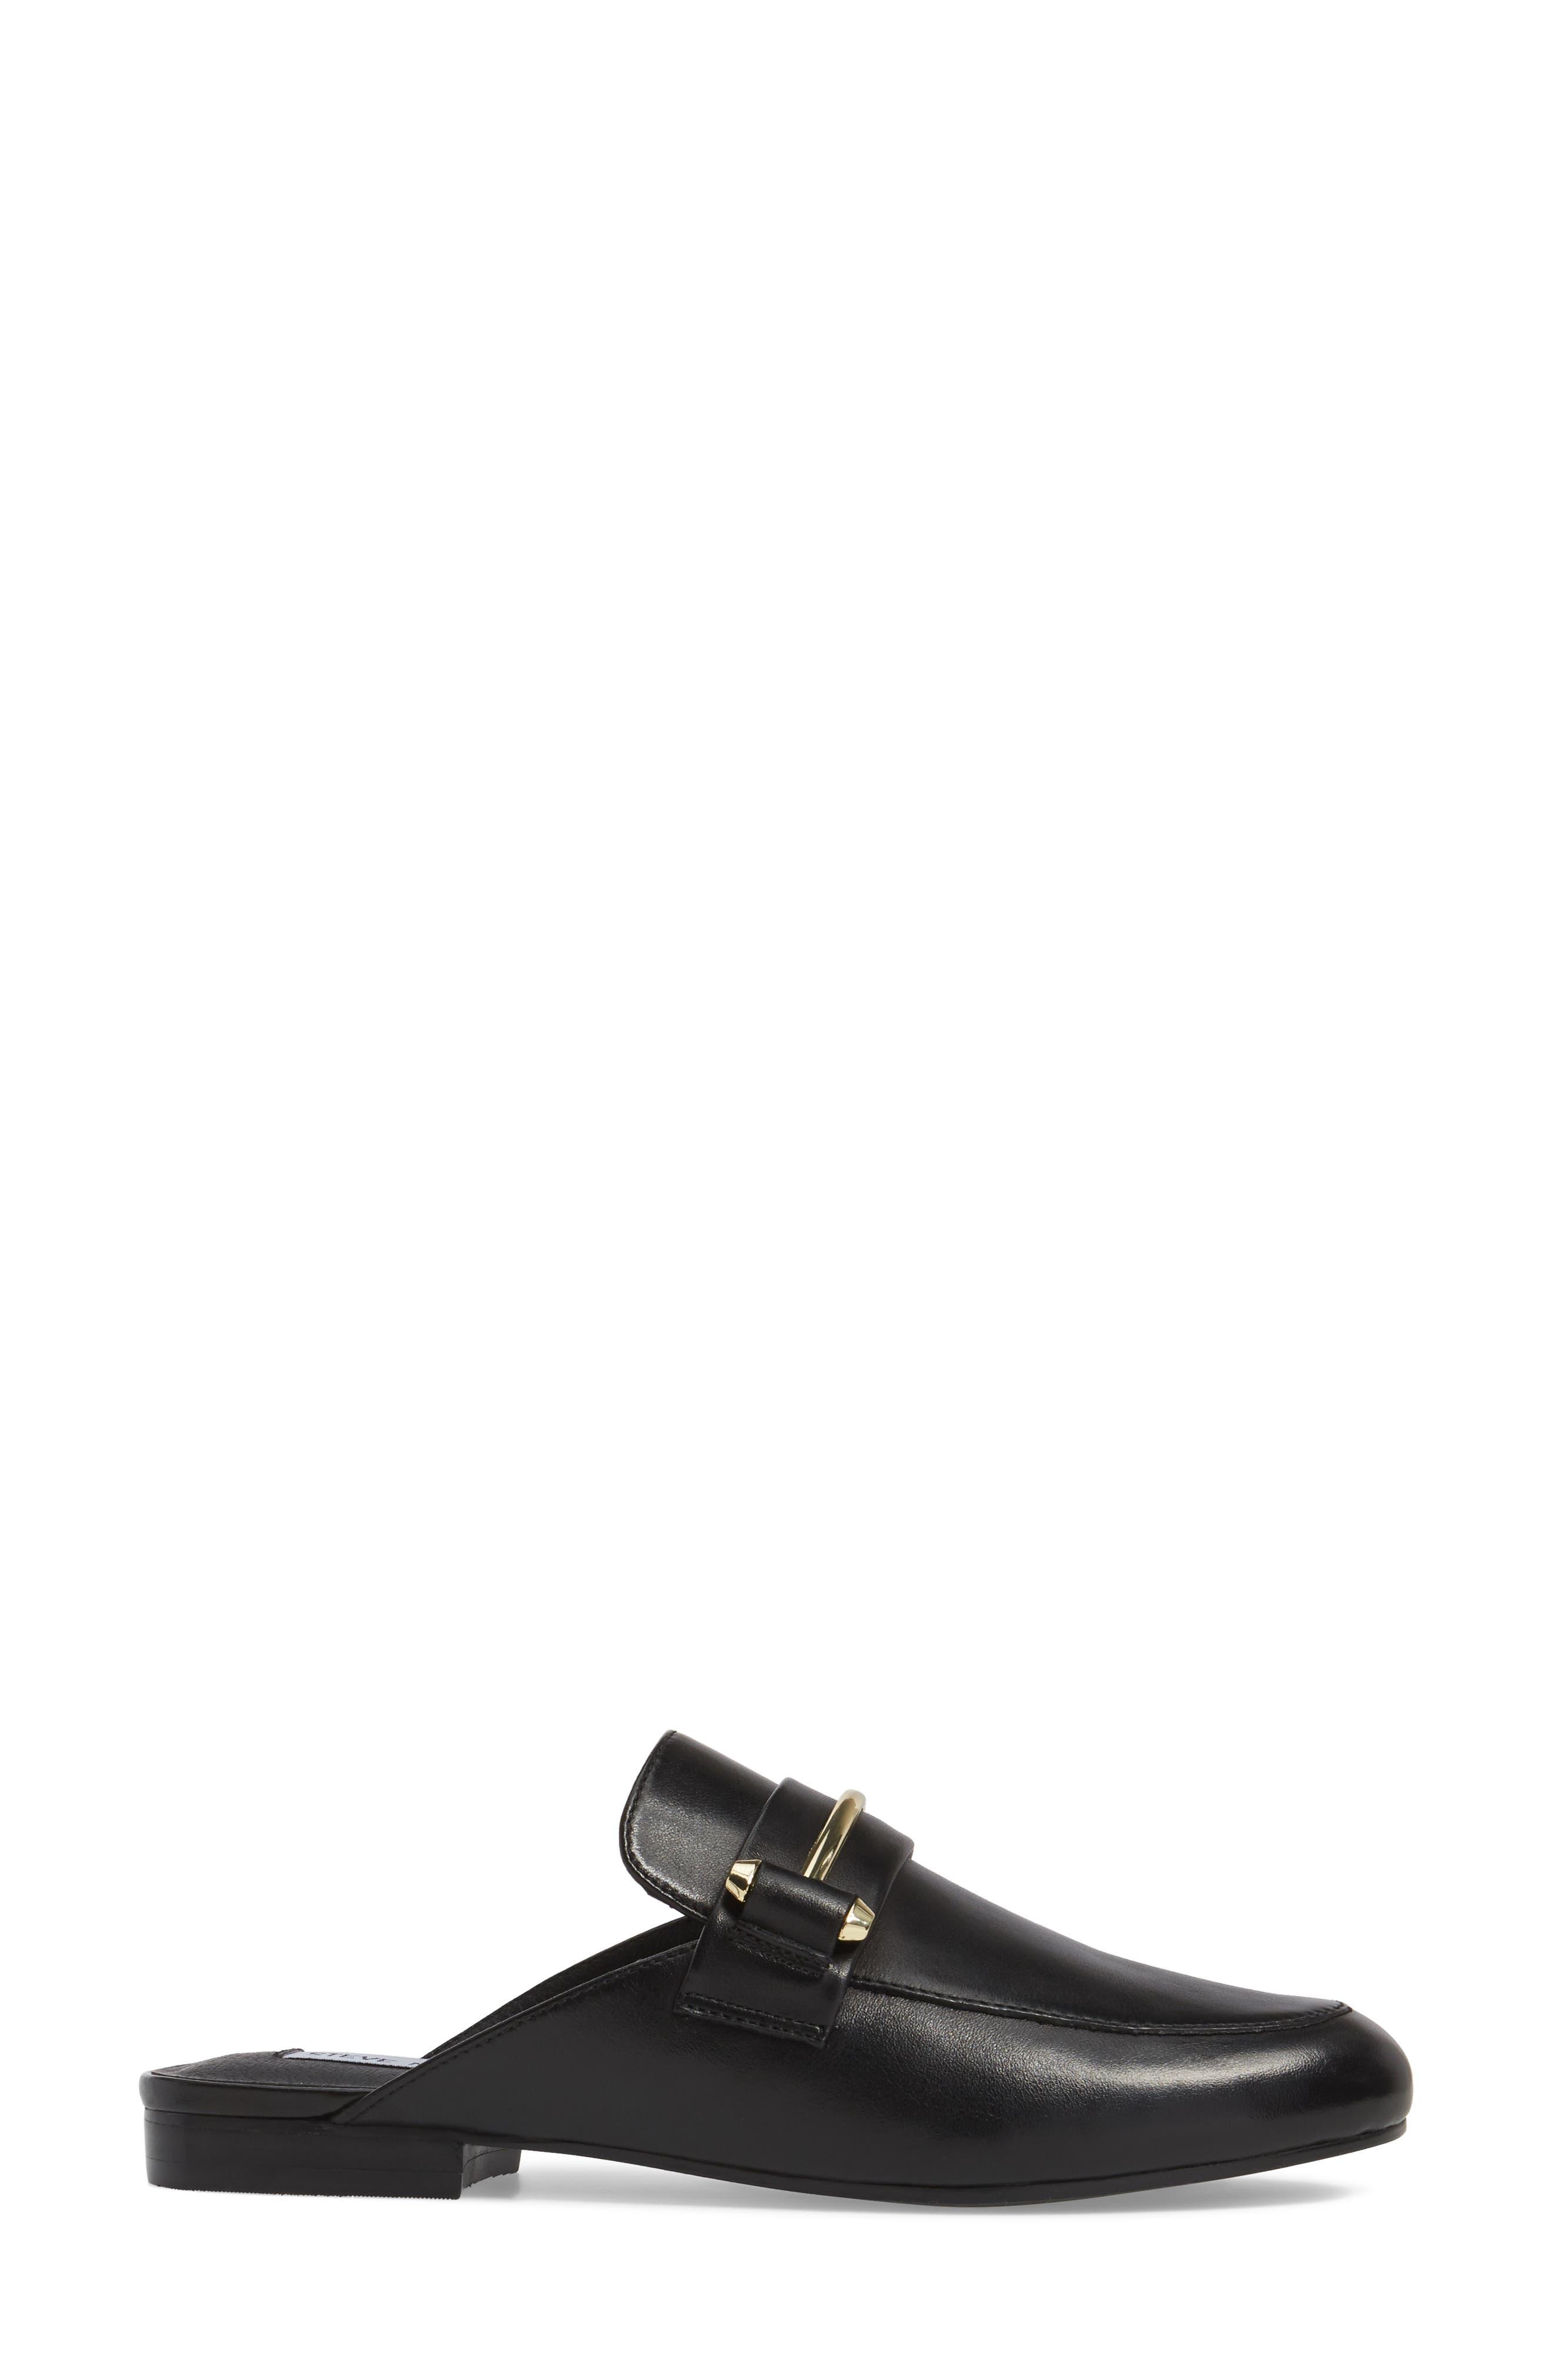 Kera Flat Loafer Mule,                             Alternate thumbnail 3, color,                             Black Leather